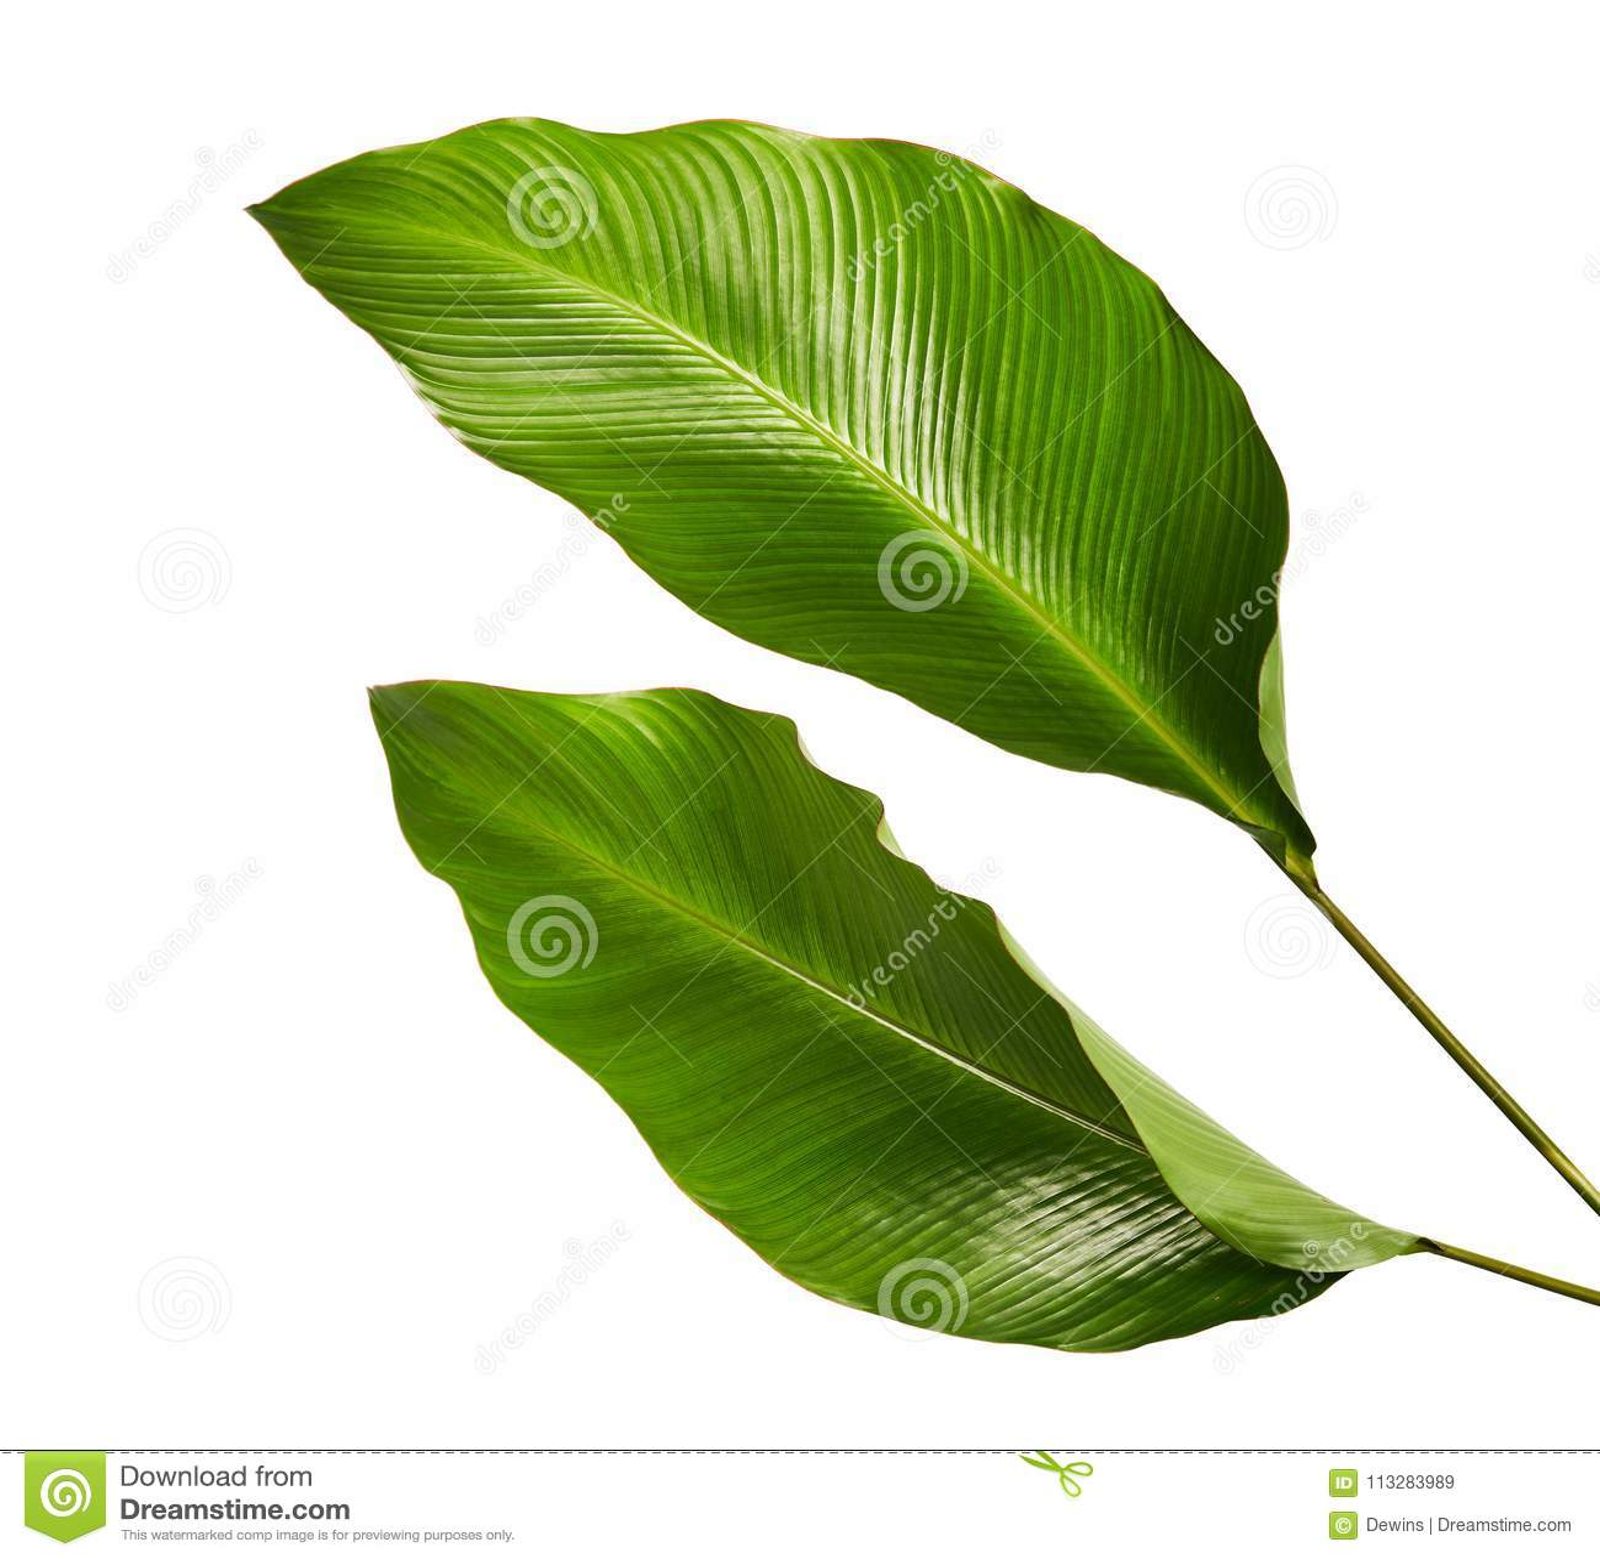 Calathea foliage, Exotic tropical leaf, Large green leaf, isolated on white background